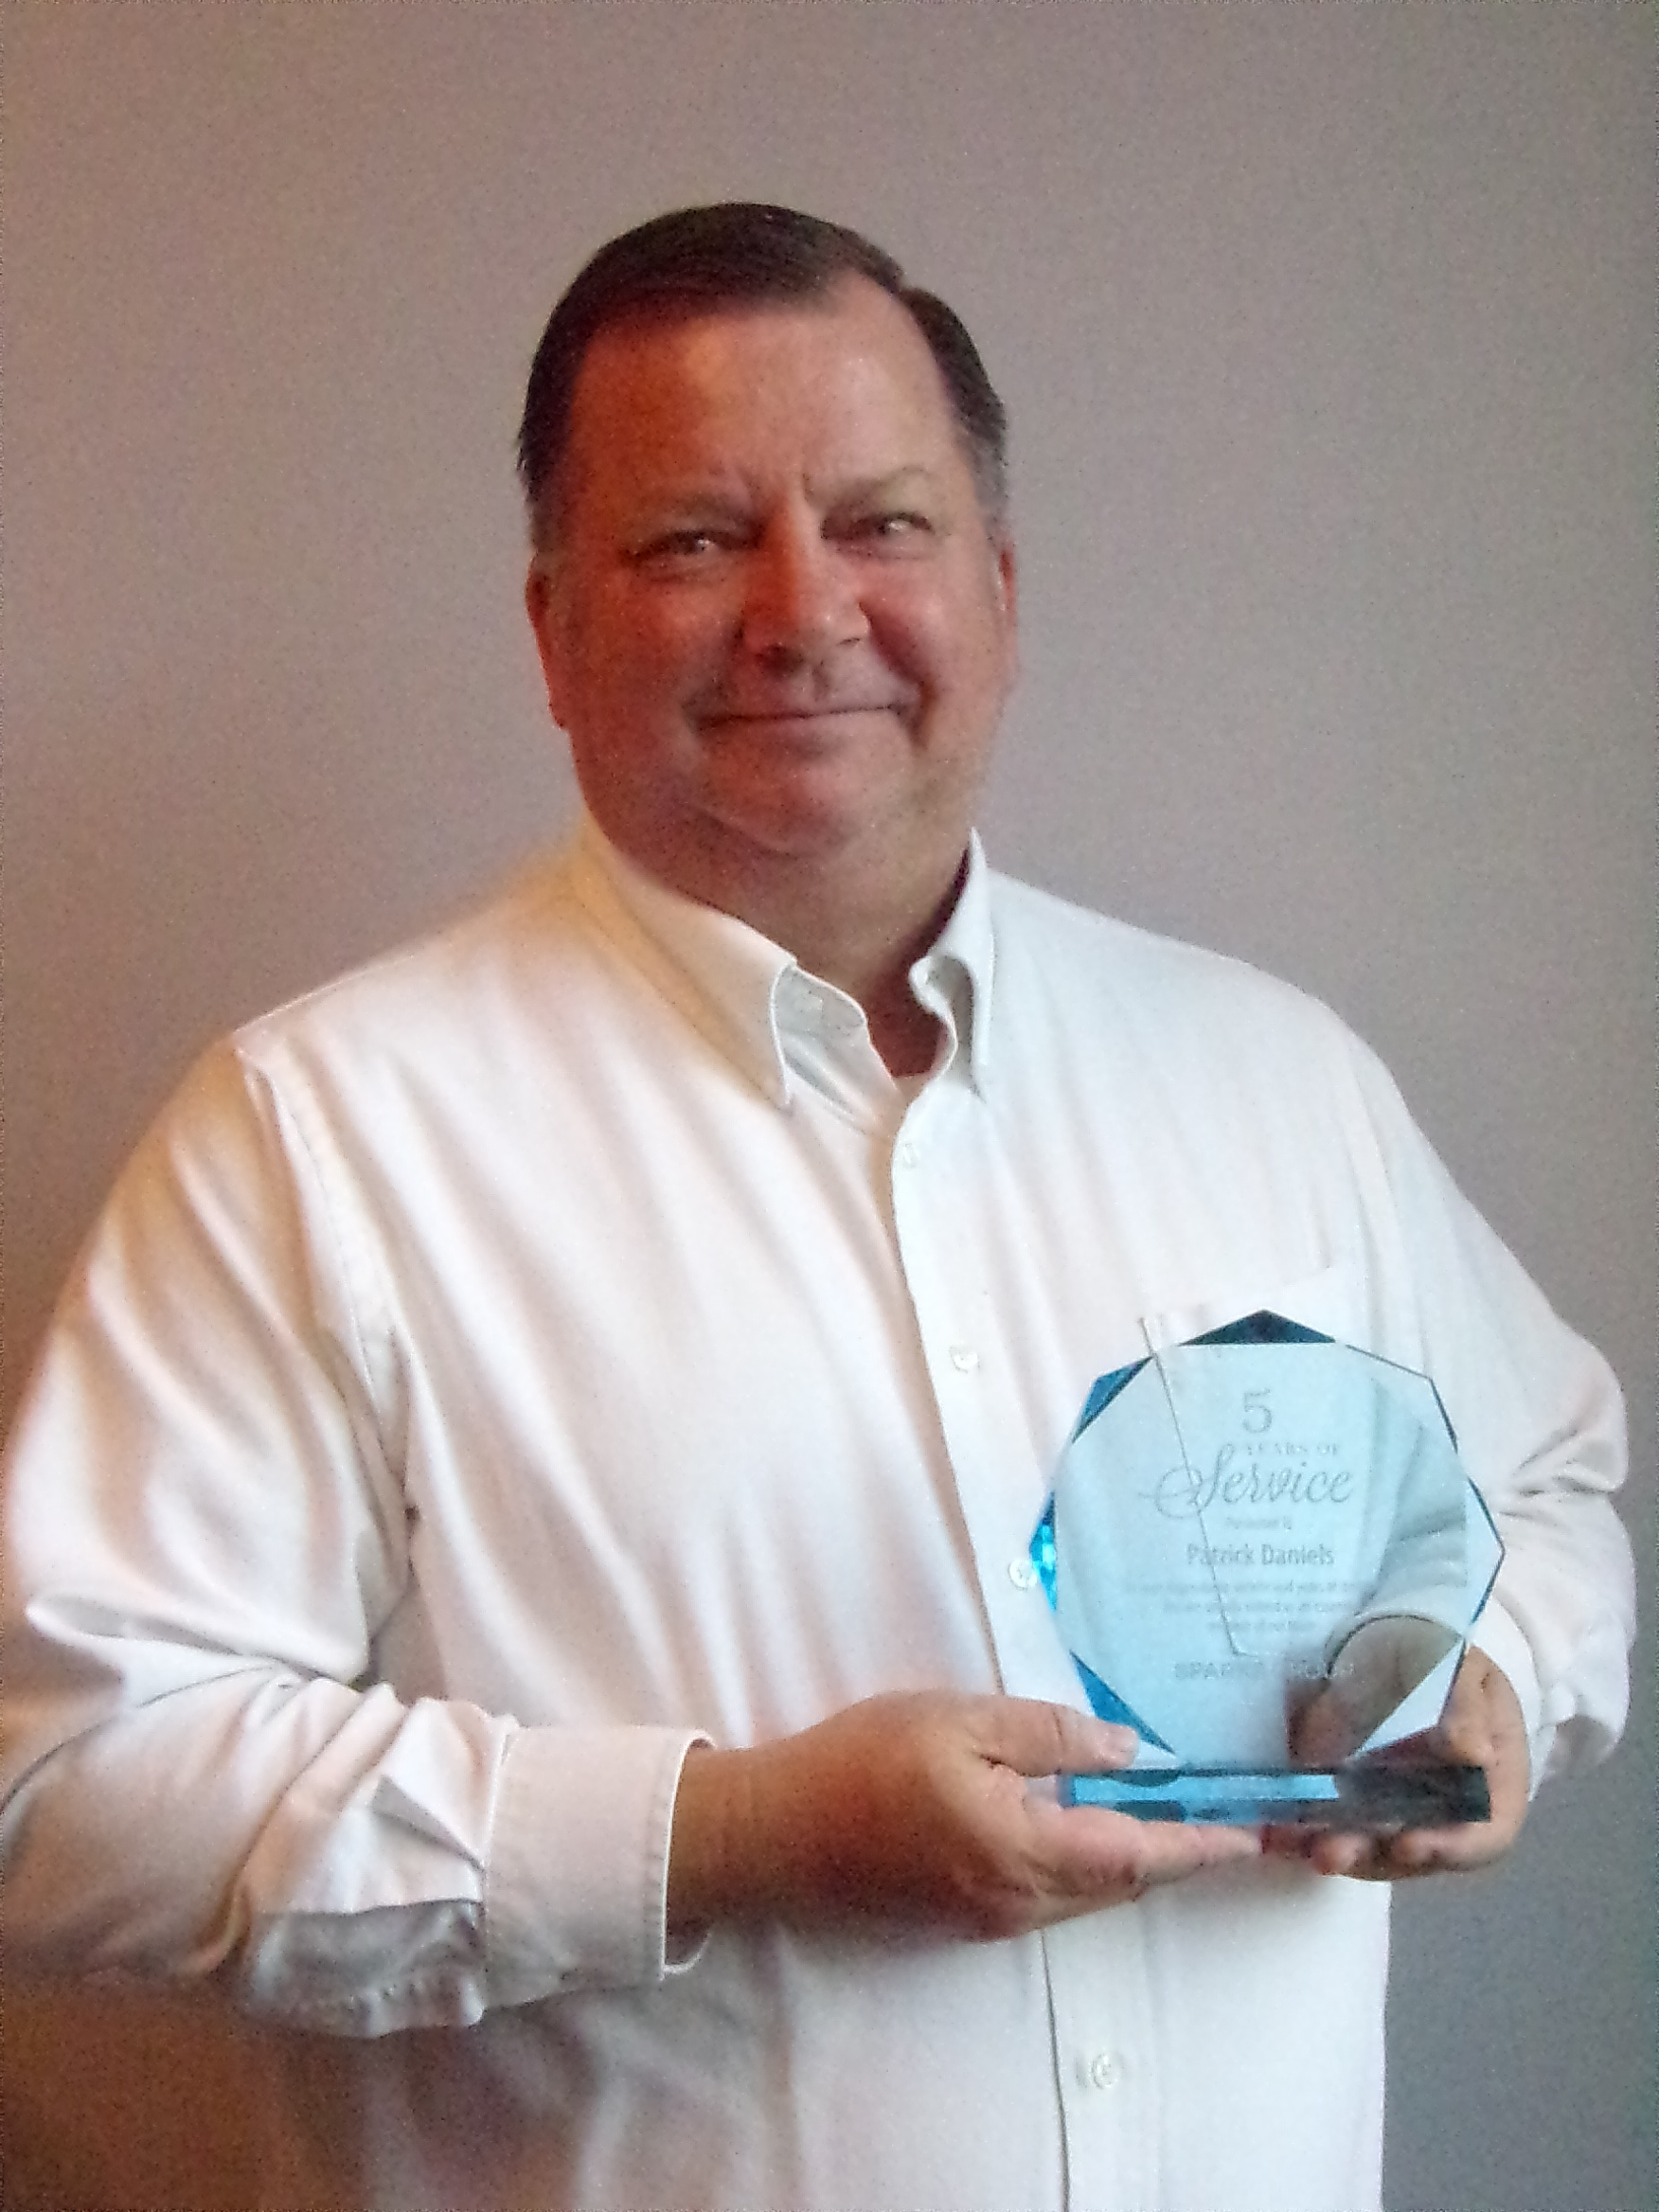 Patrick Daniels, Controller - 5 Year Employee Anniversary